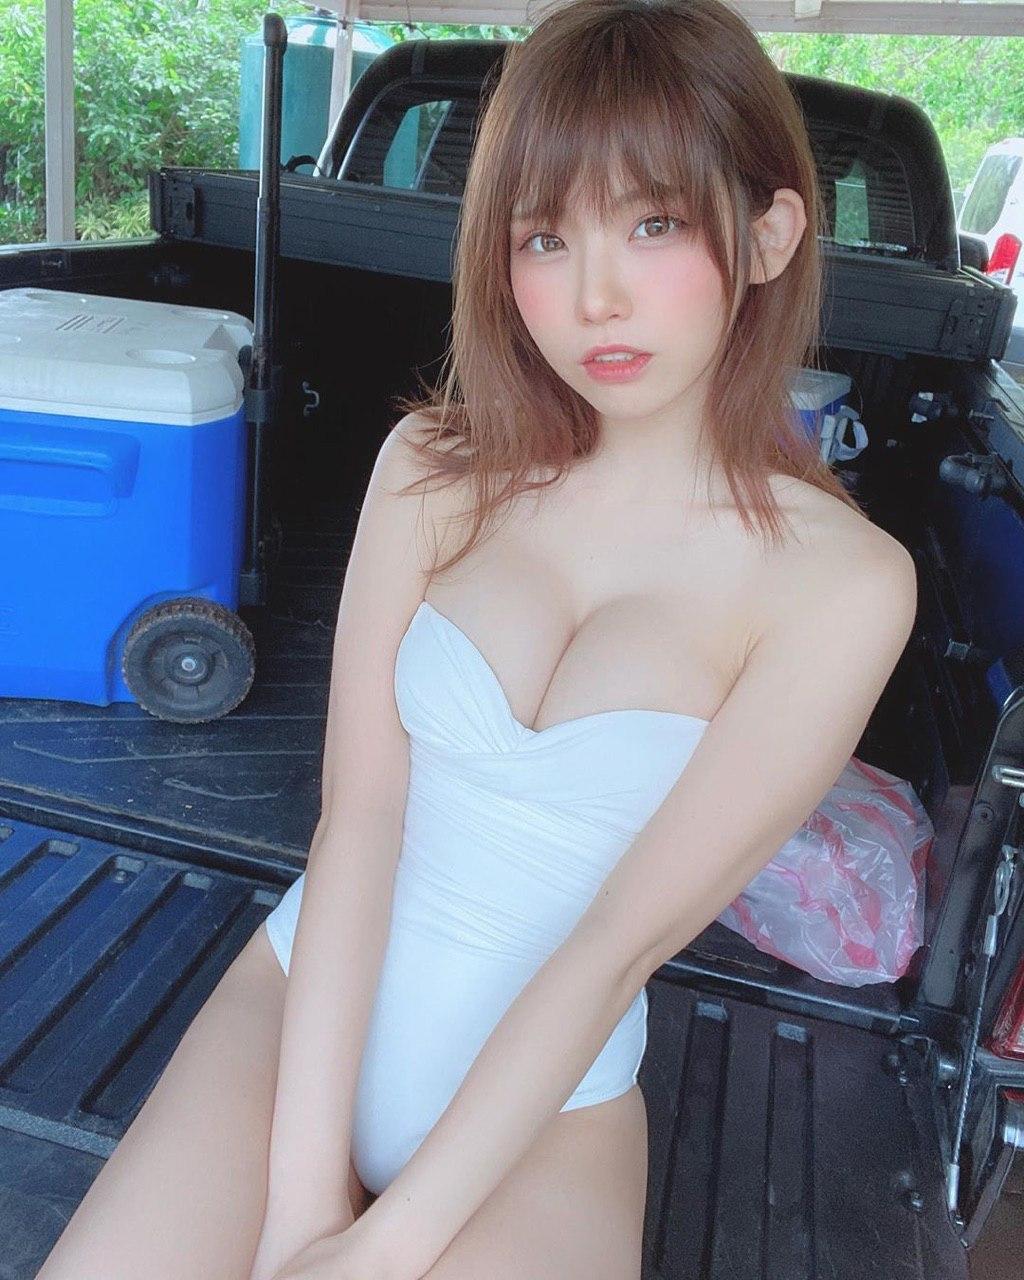 photo_3643@10-03-2020_10-21-58.jpg